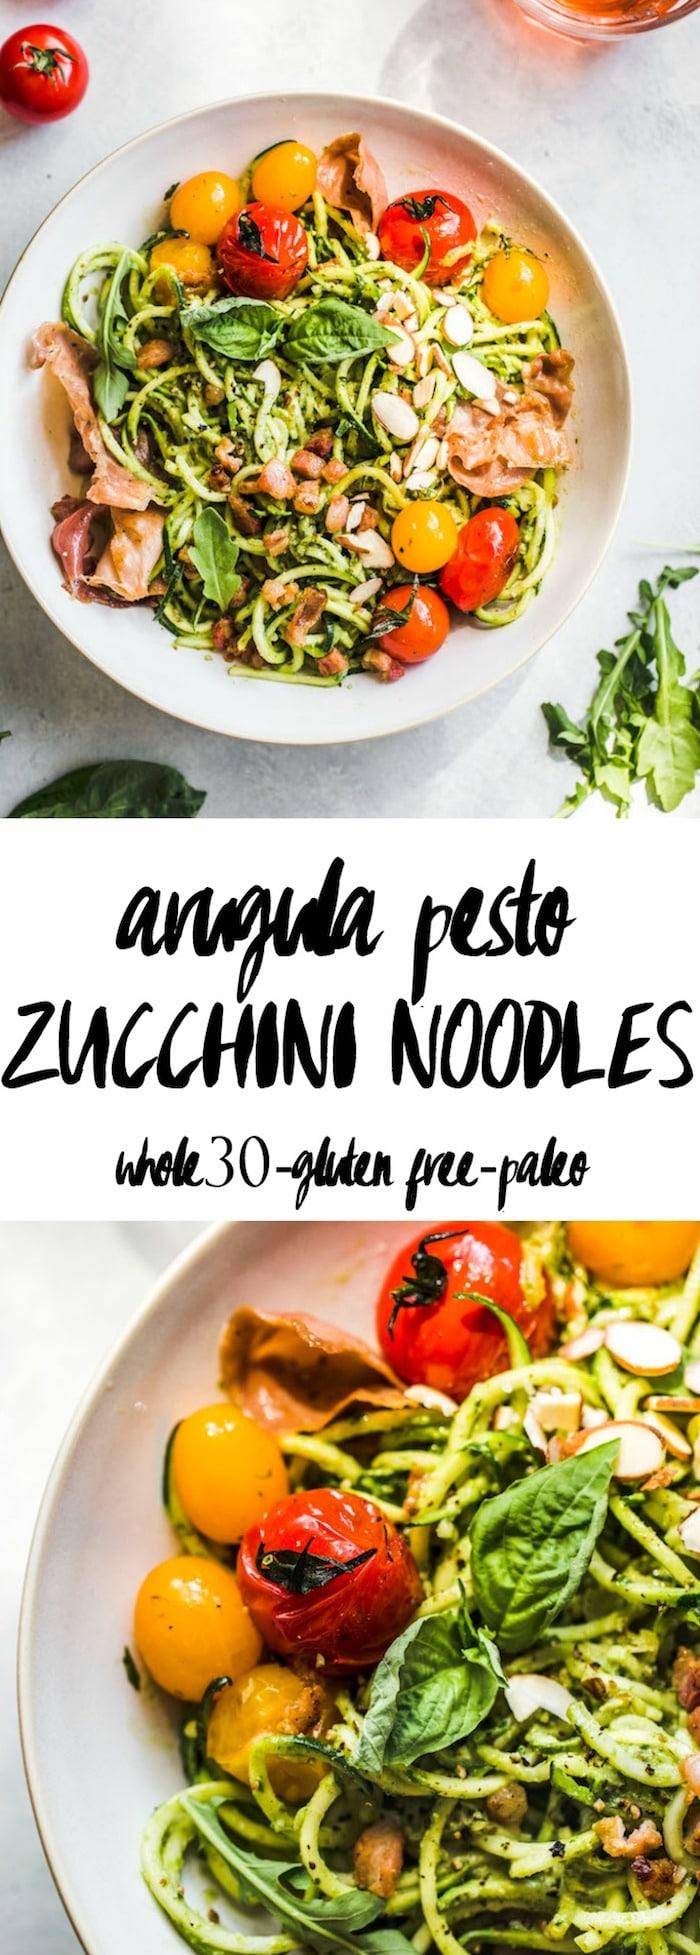 Arugula Pesto Zucchini Noodle Bowl with tomatoes and prosciutto--whole30, too!